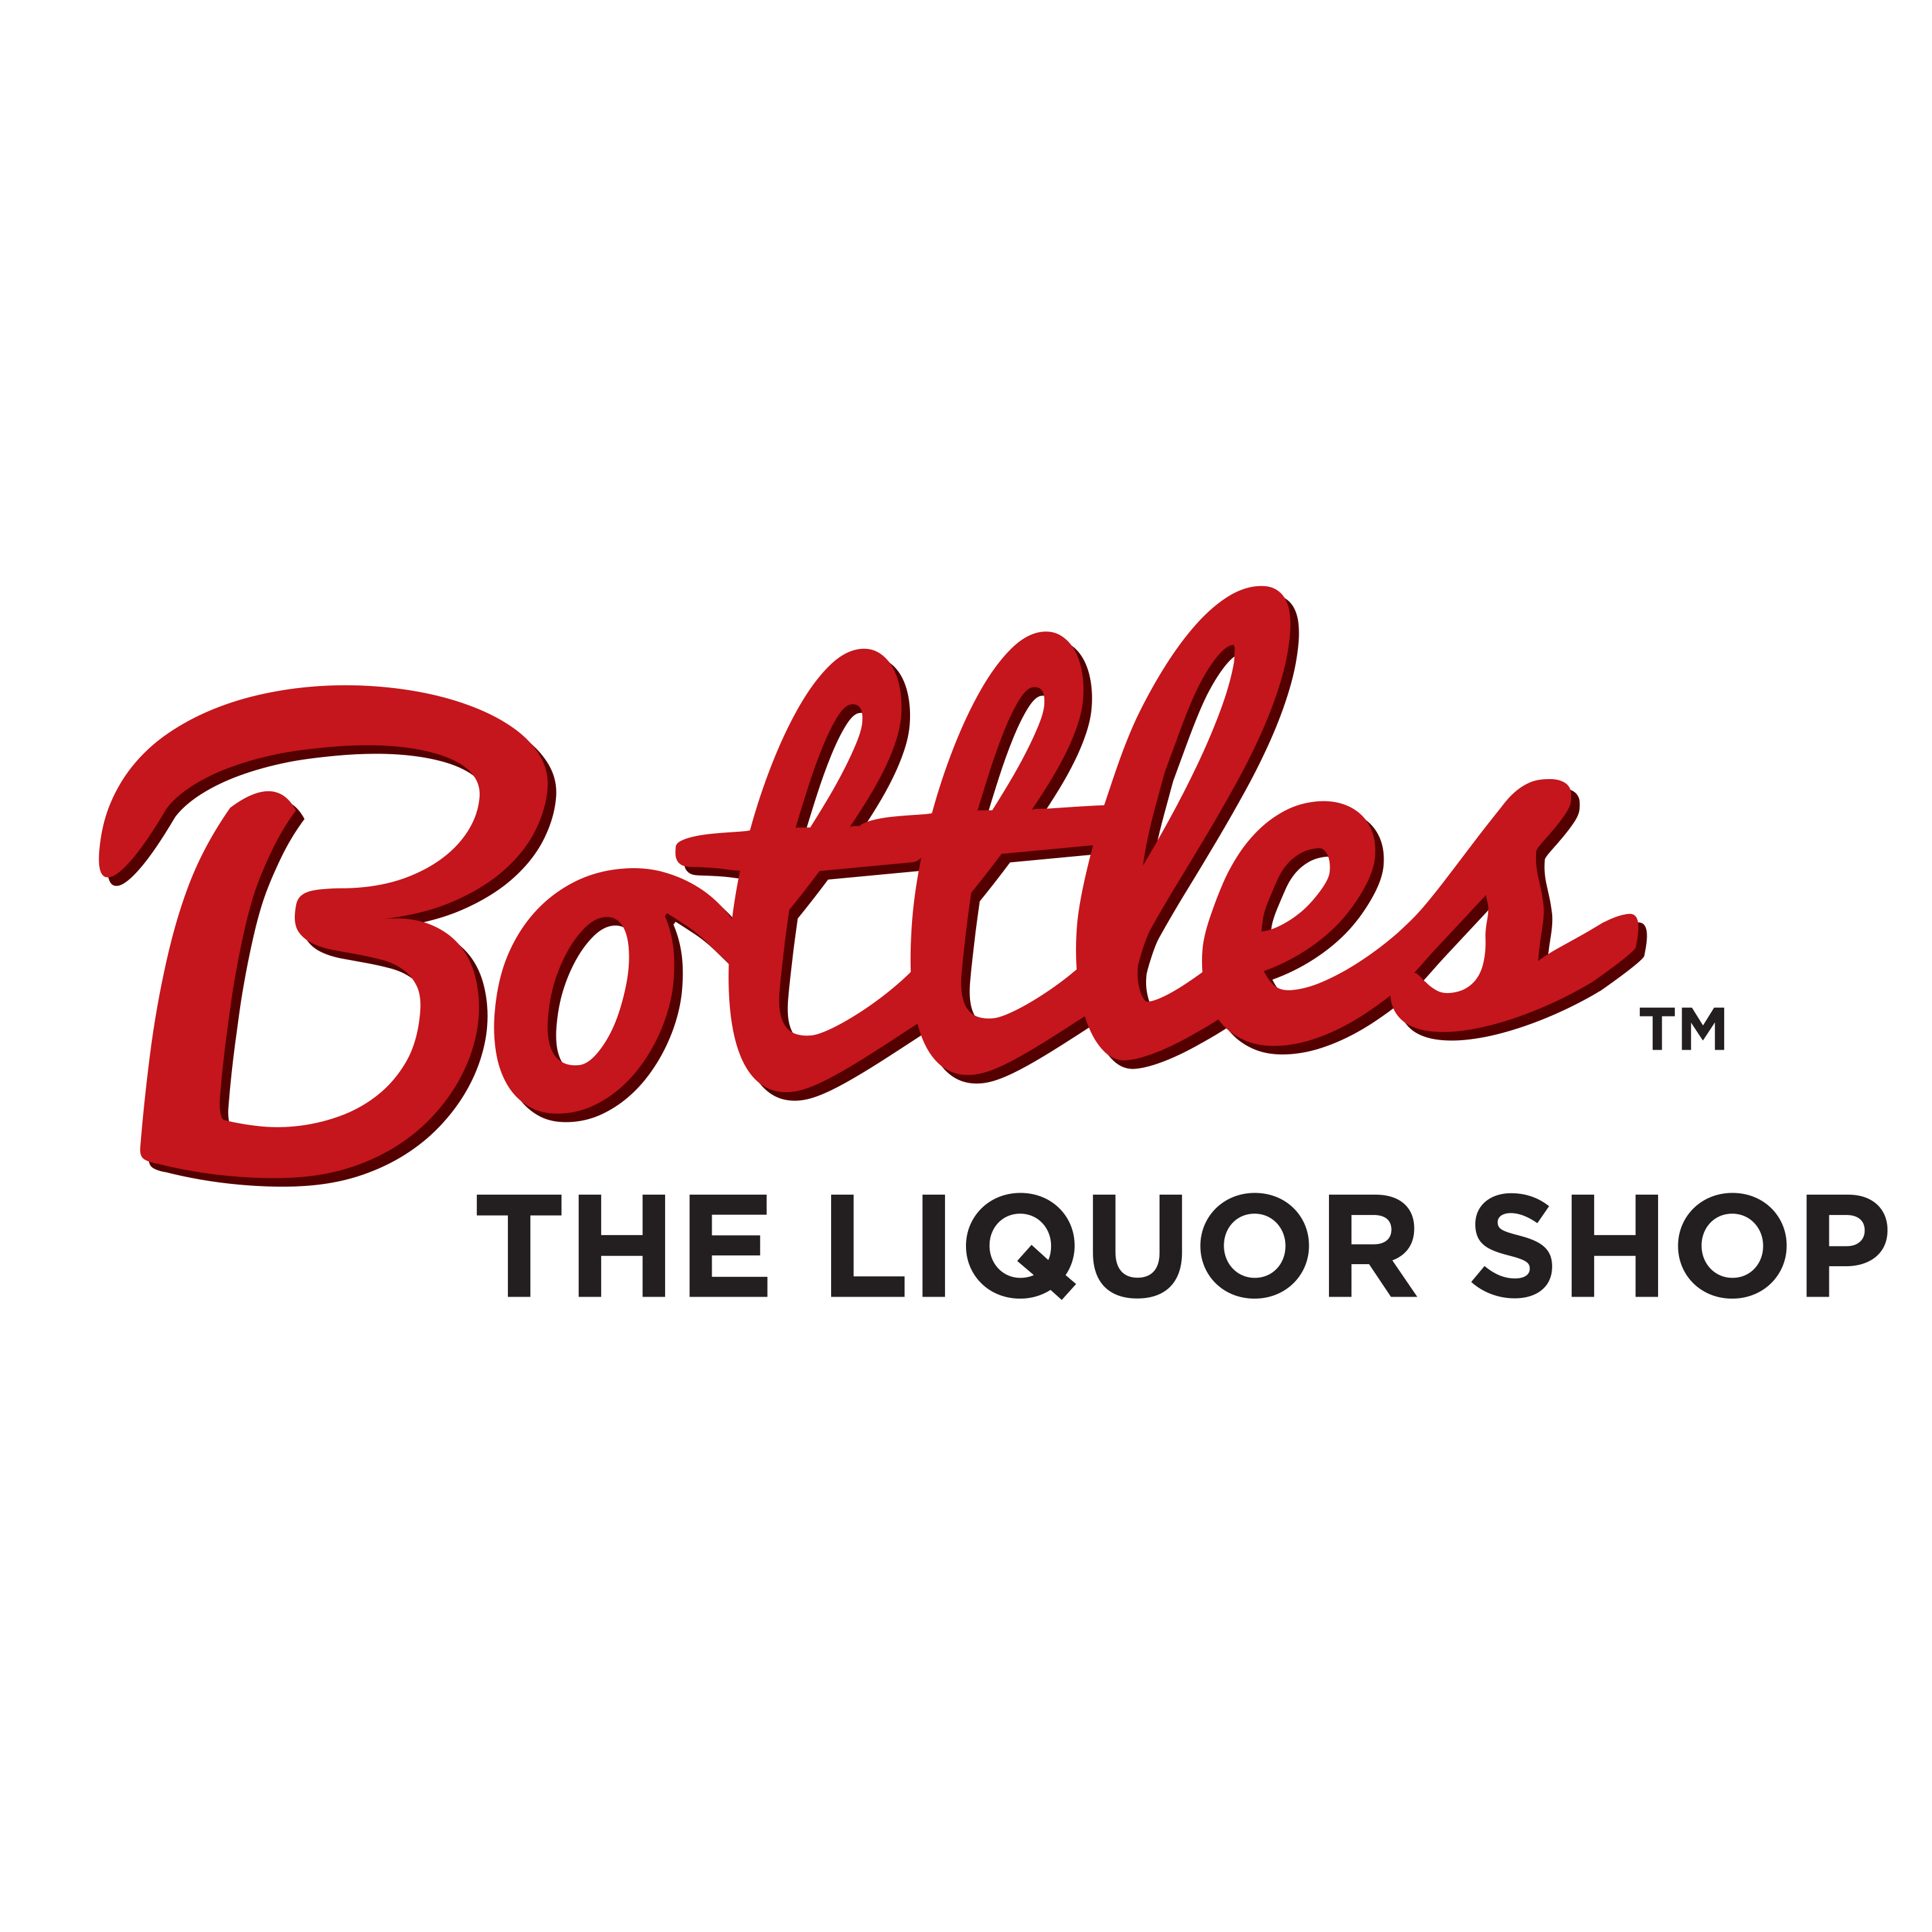 Bottles The Liquor Shop Logo